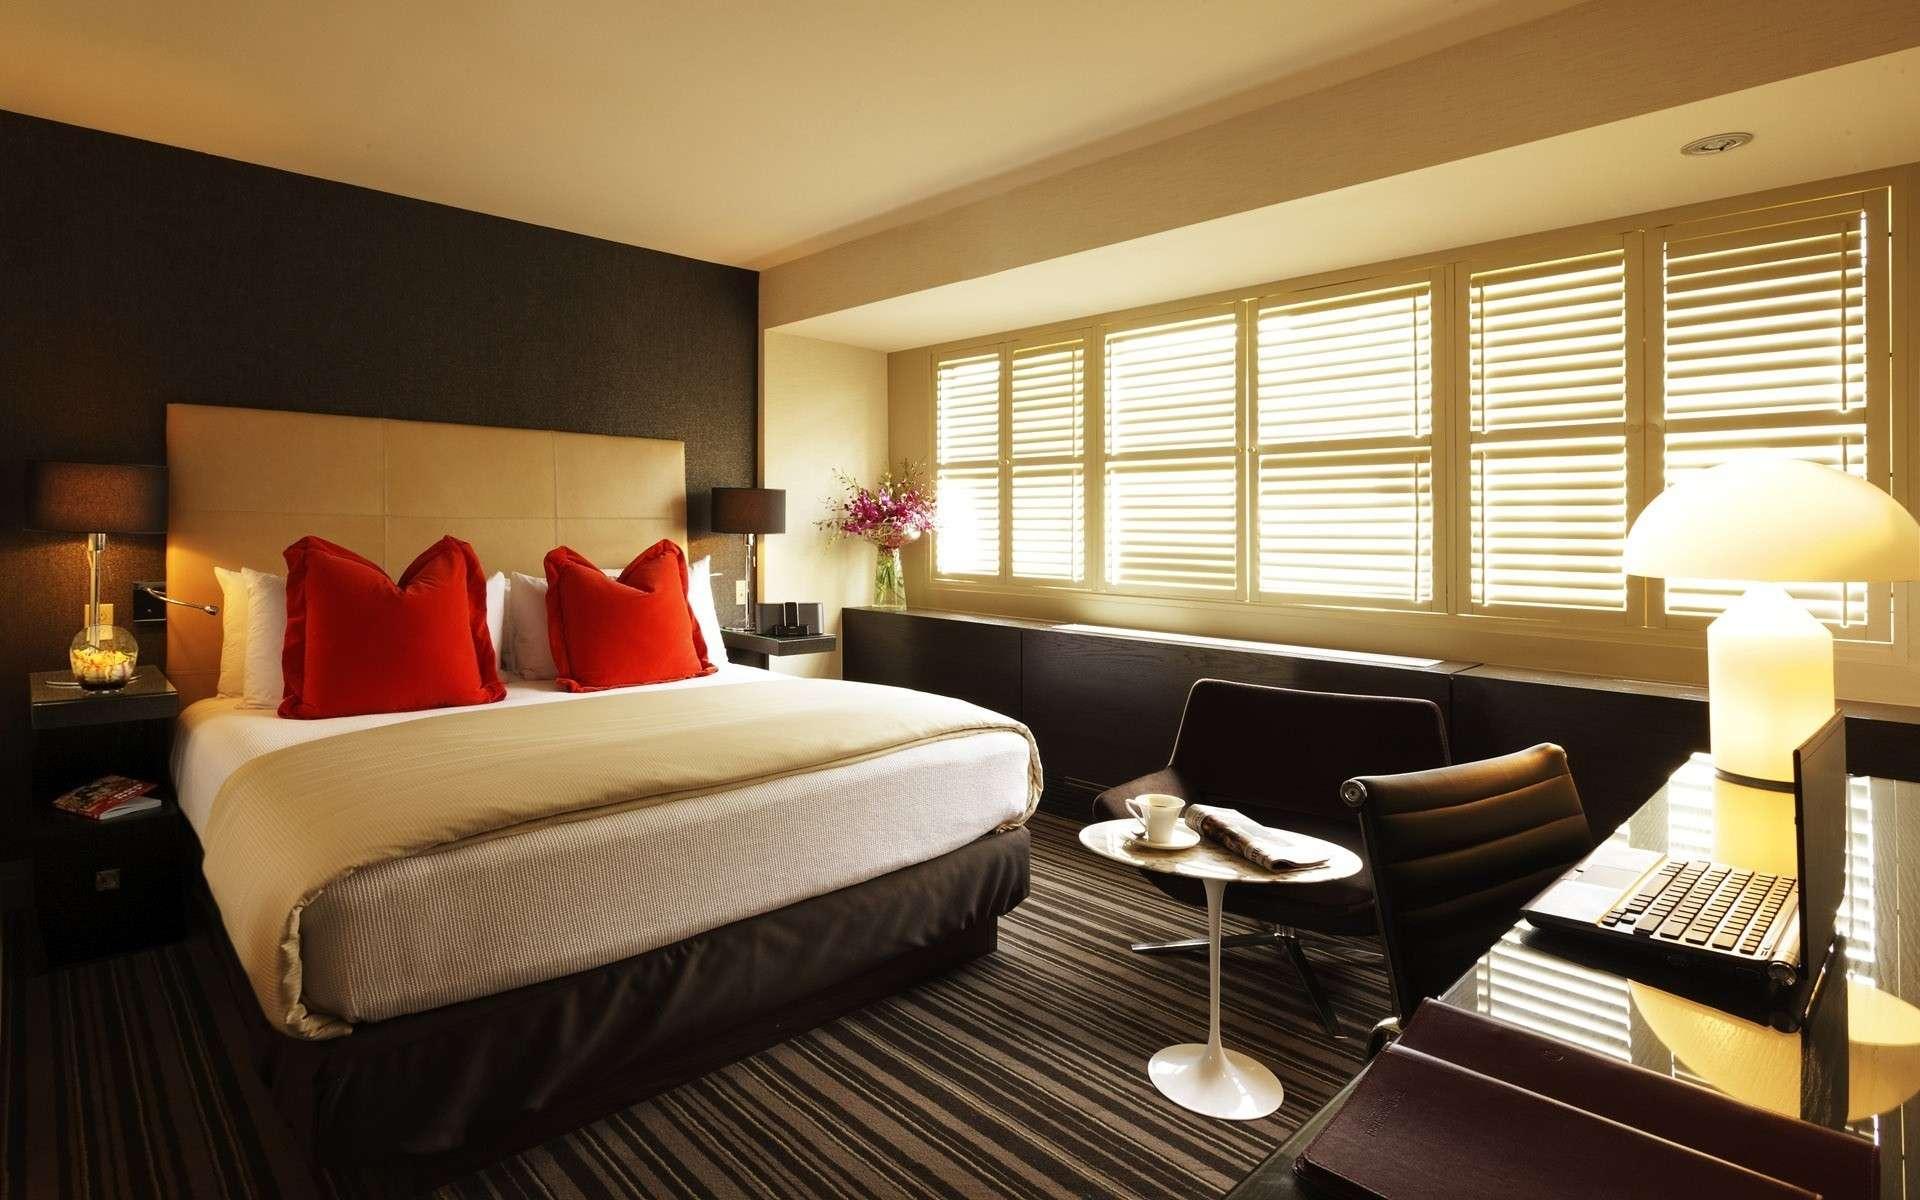 Hotel Room Photos